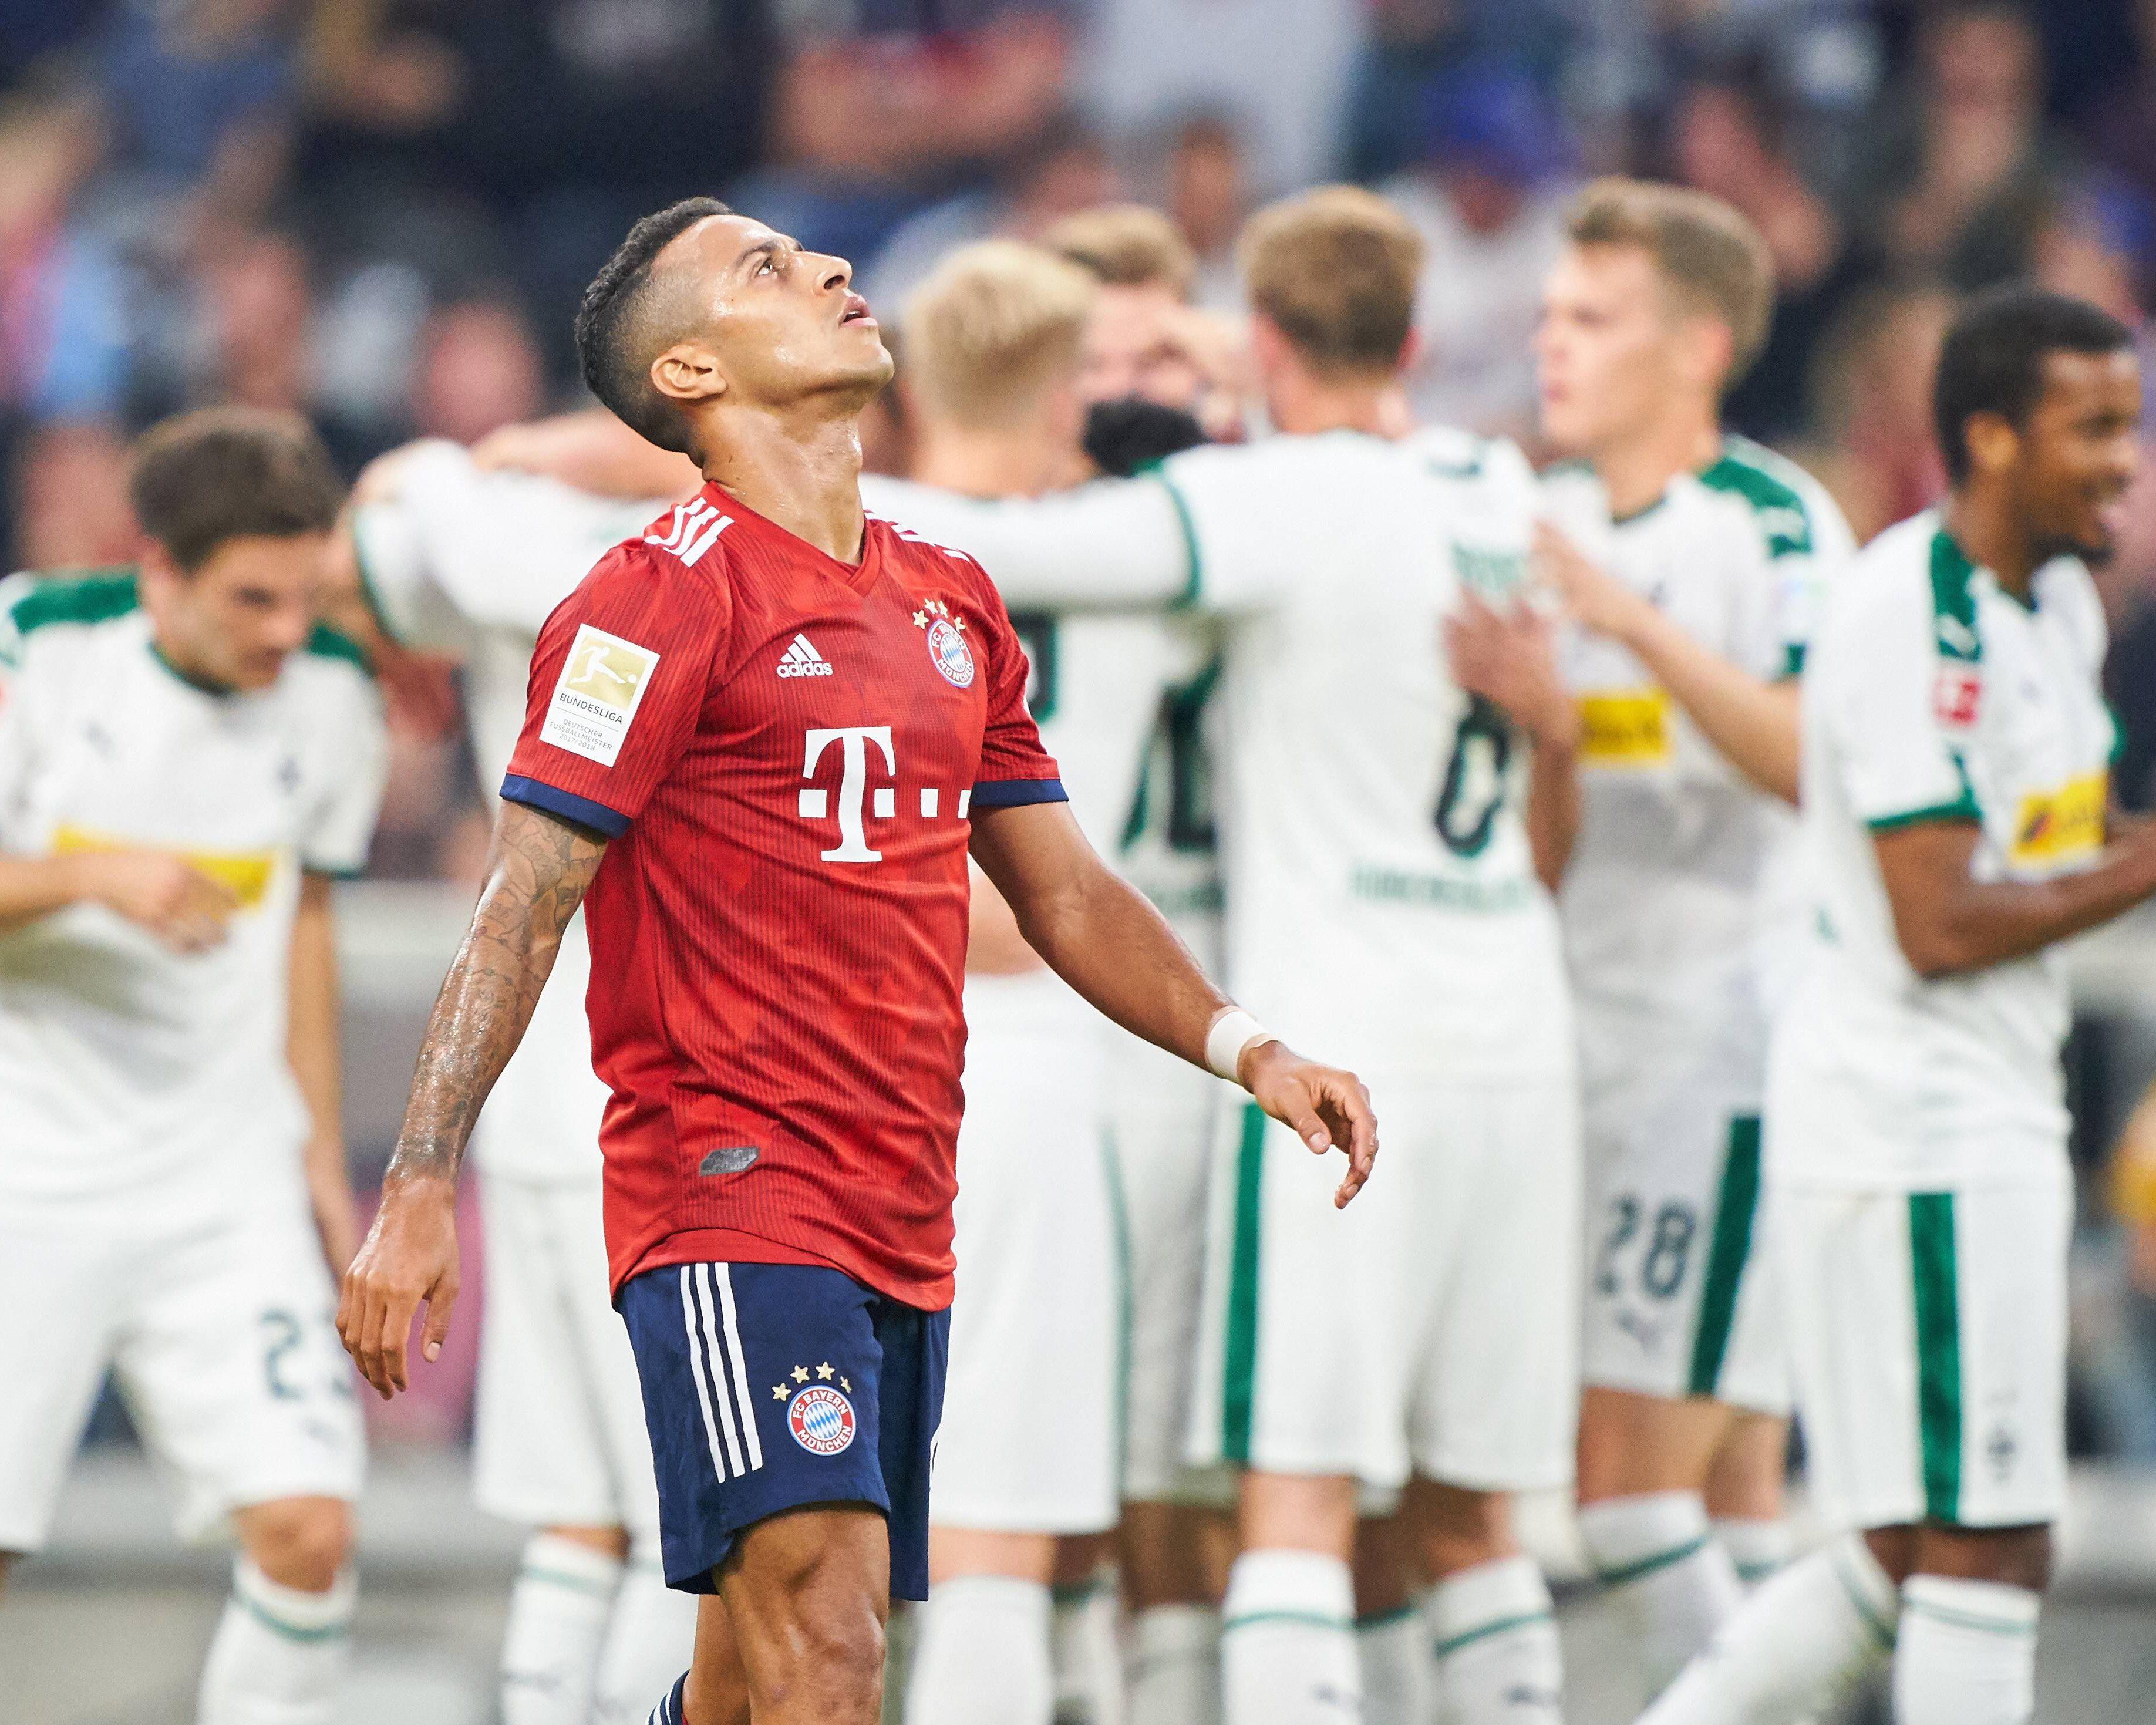 Ergebnis Bayern Heute